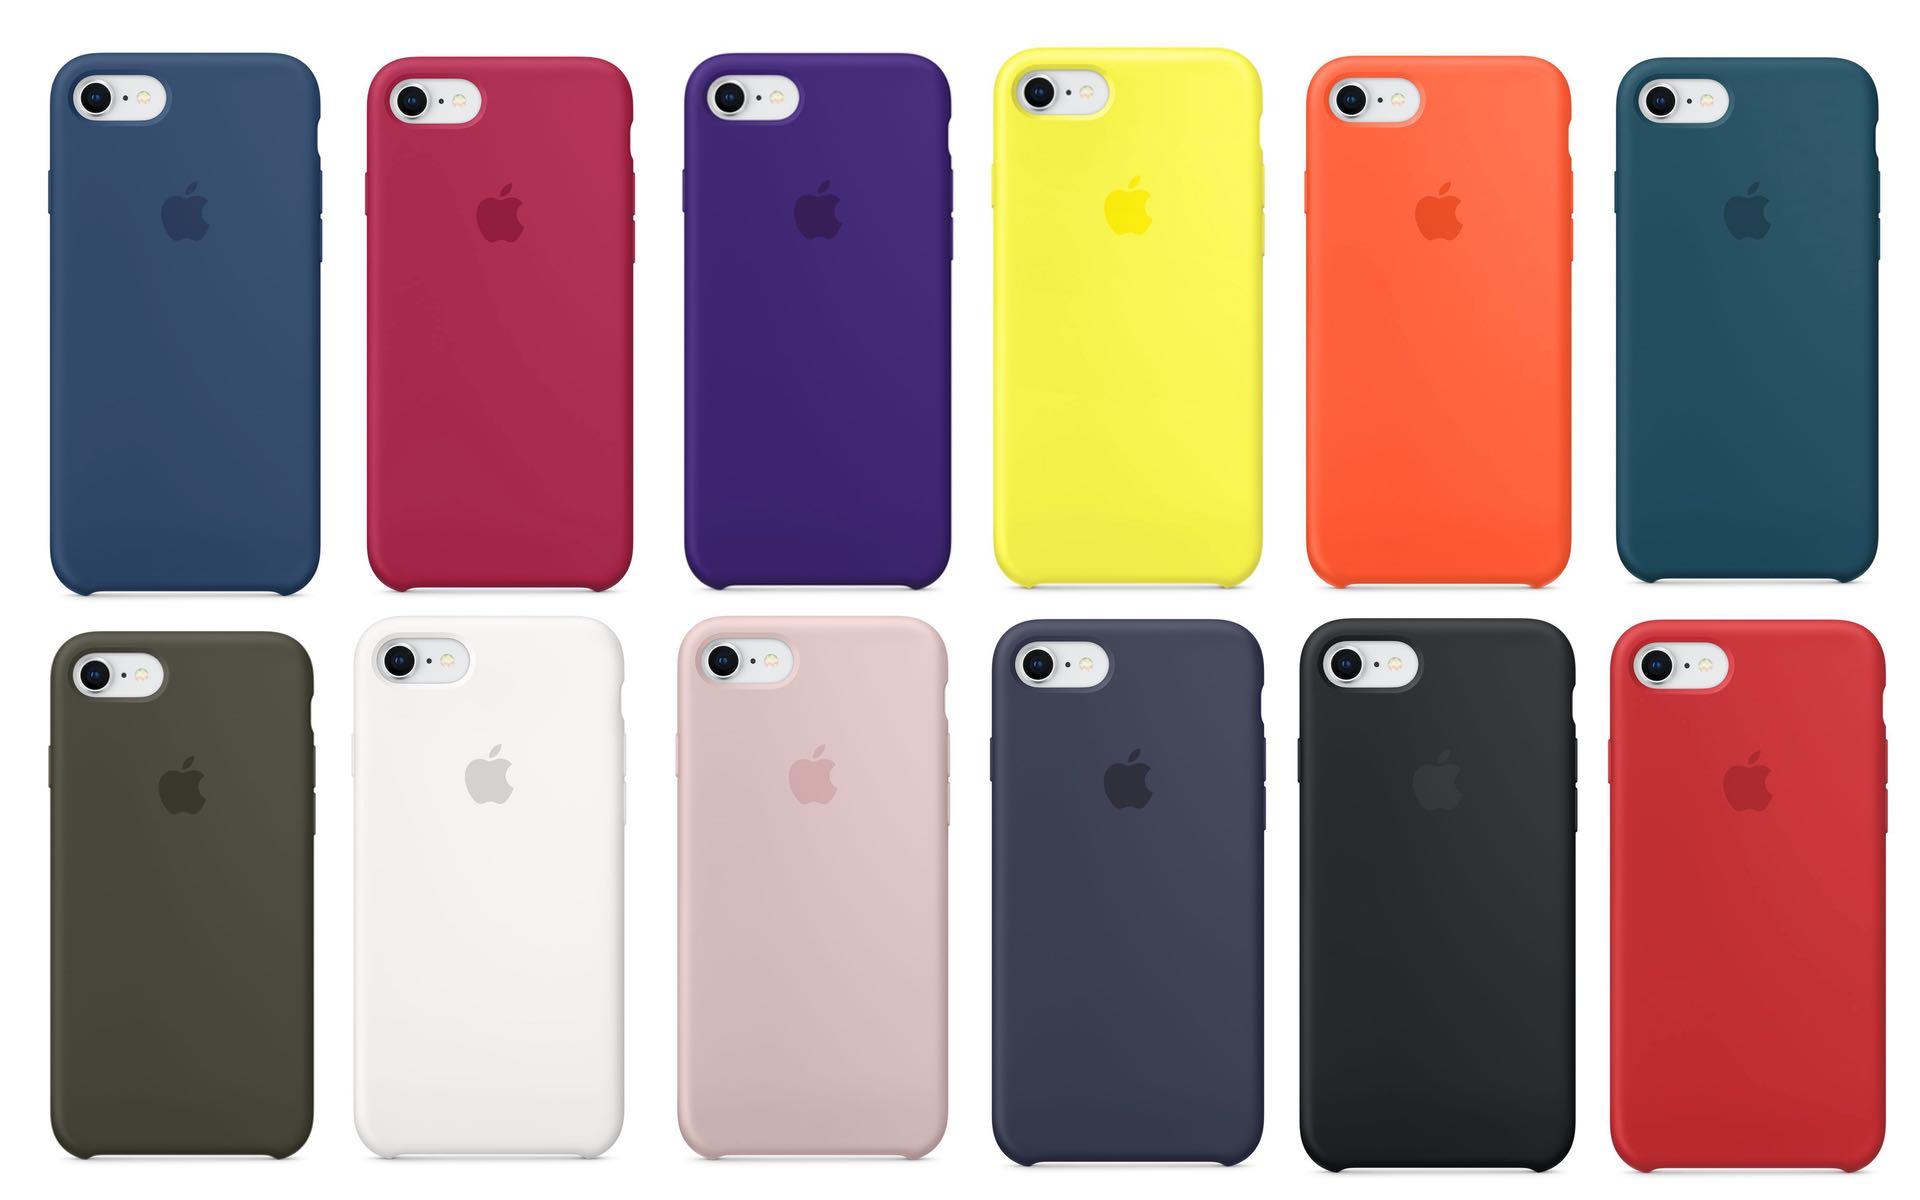 iPhone8/8PlusApple純正シリコーンケースの写真